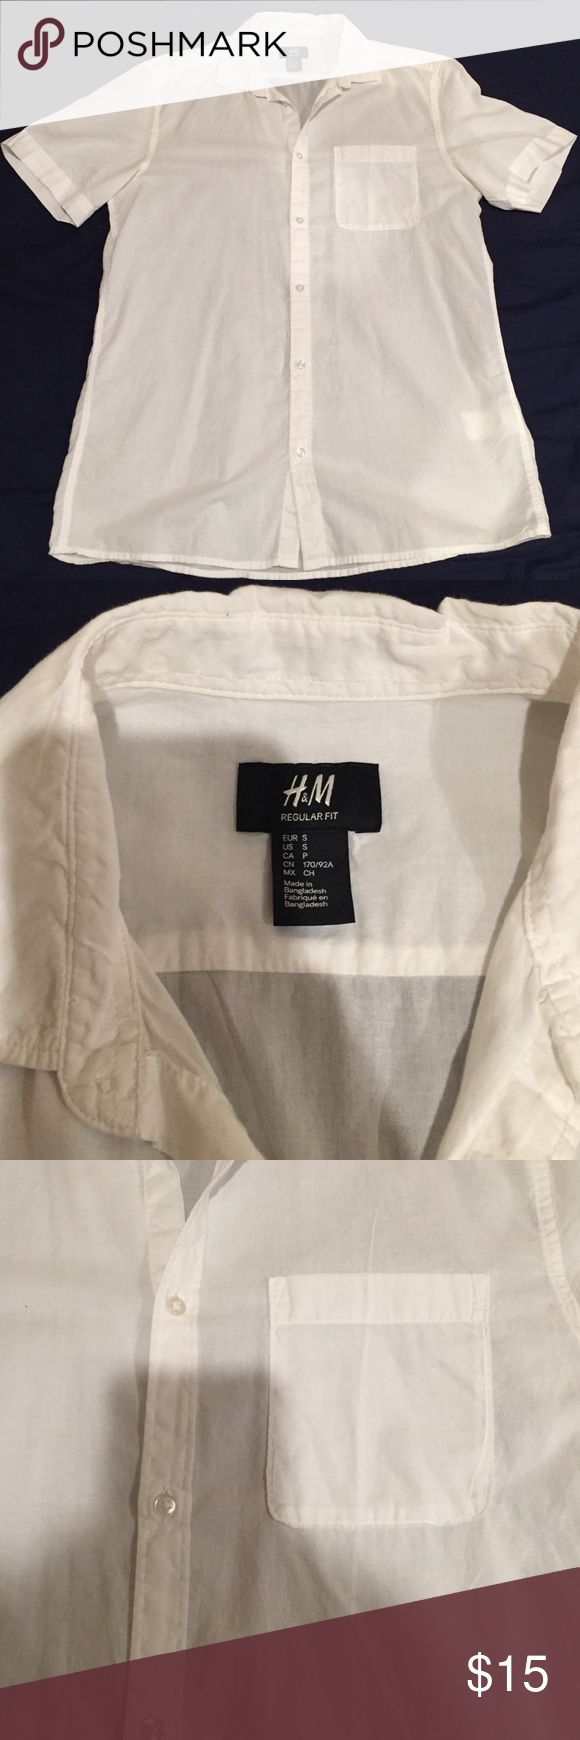 H&M Men's Regular Fit white button down H&M Men's Regular Fit white button down H&M Shirts Casual Button Down Shirts